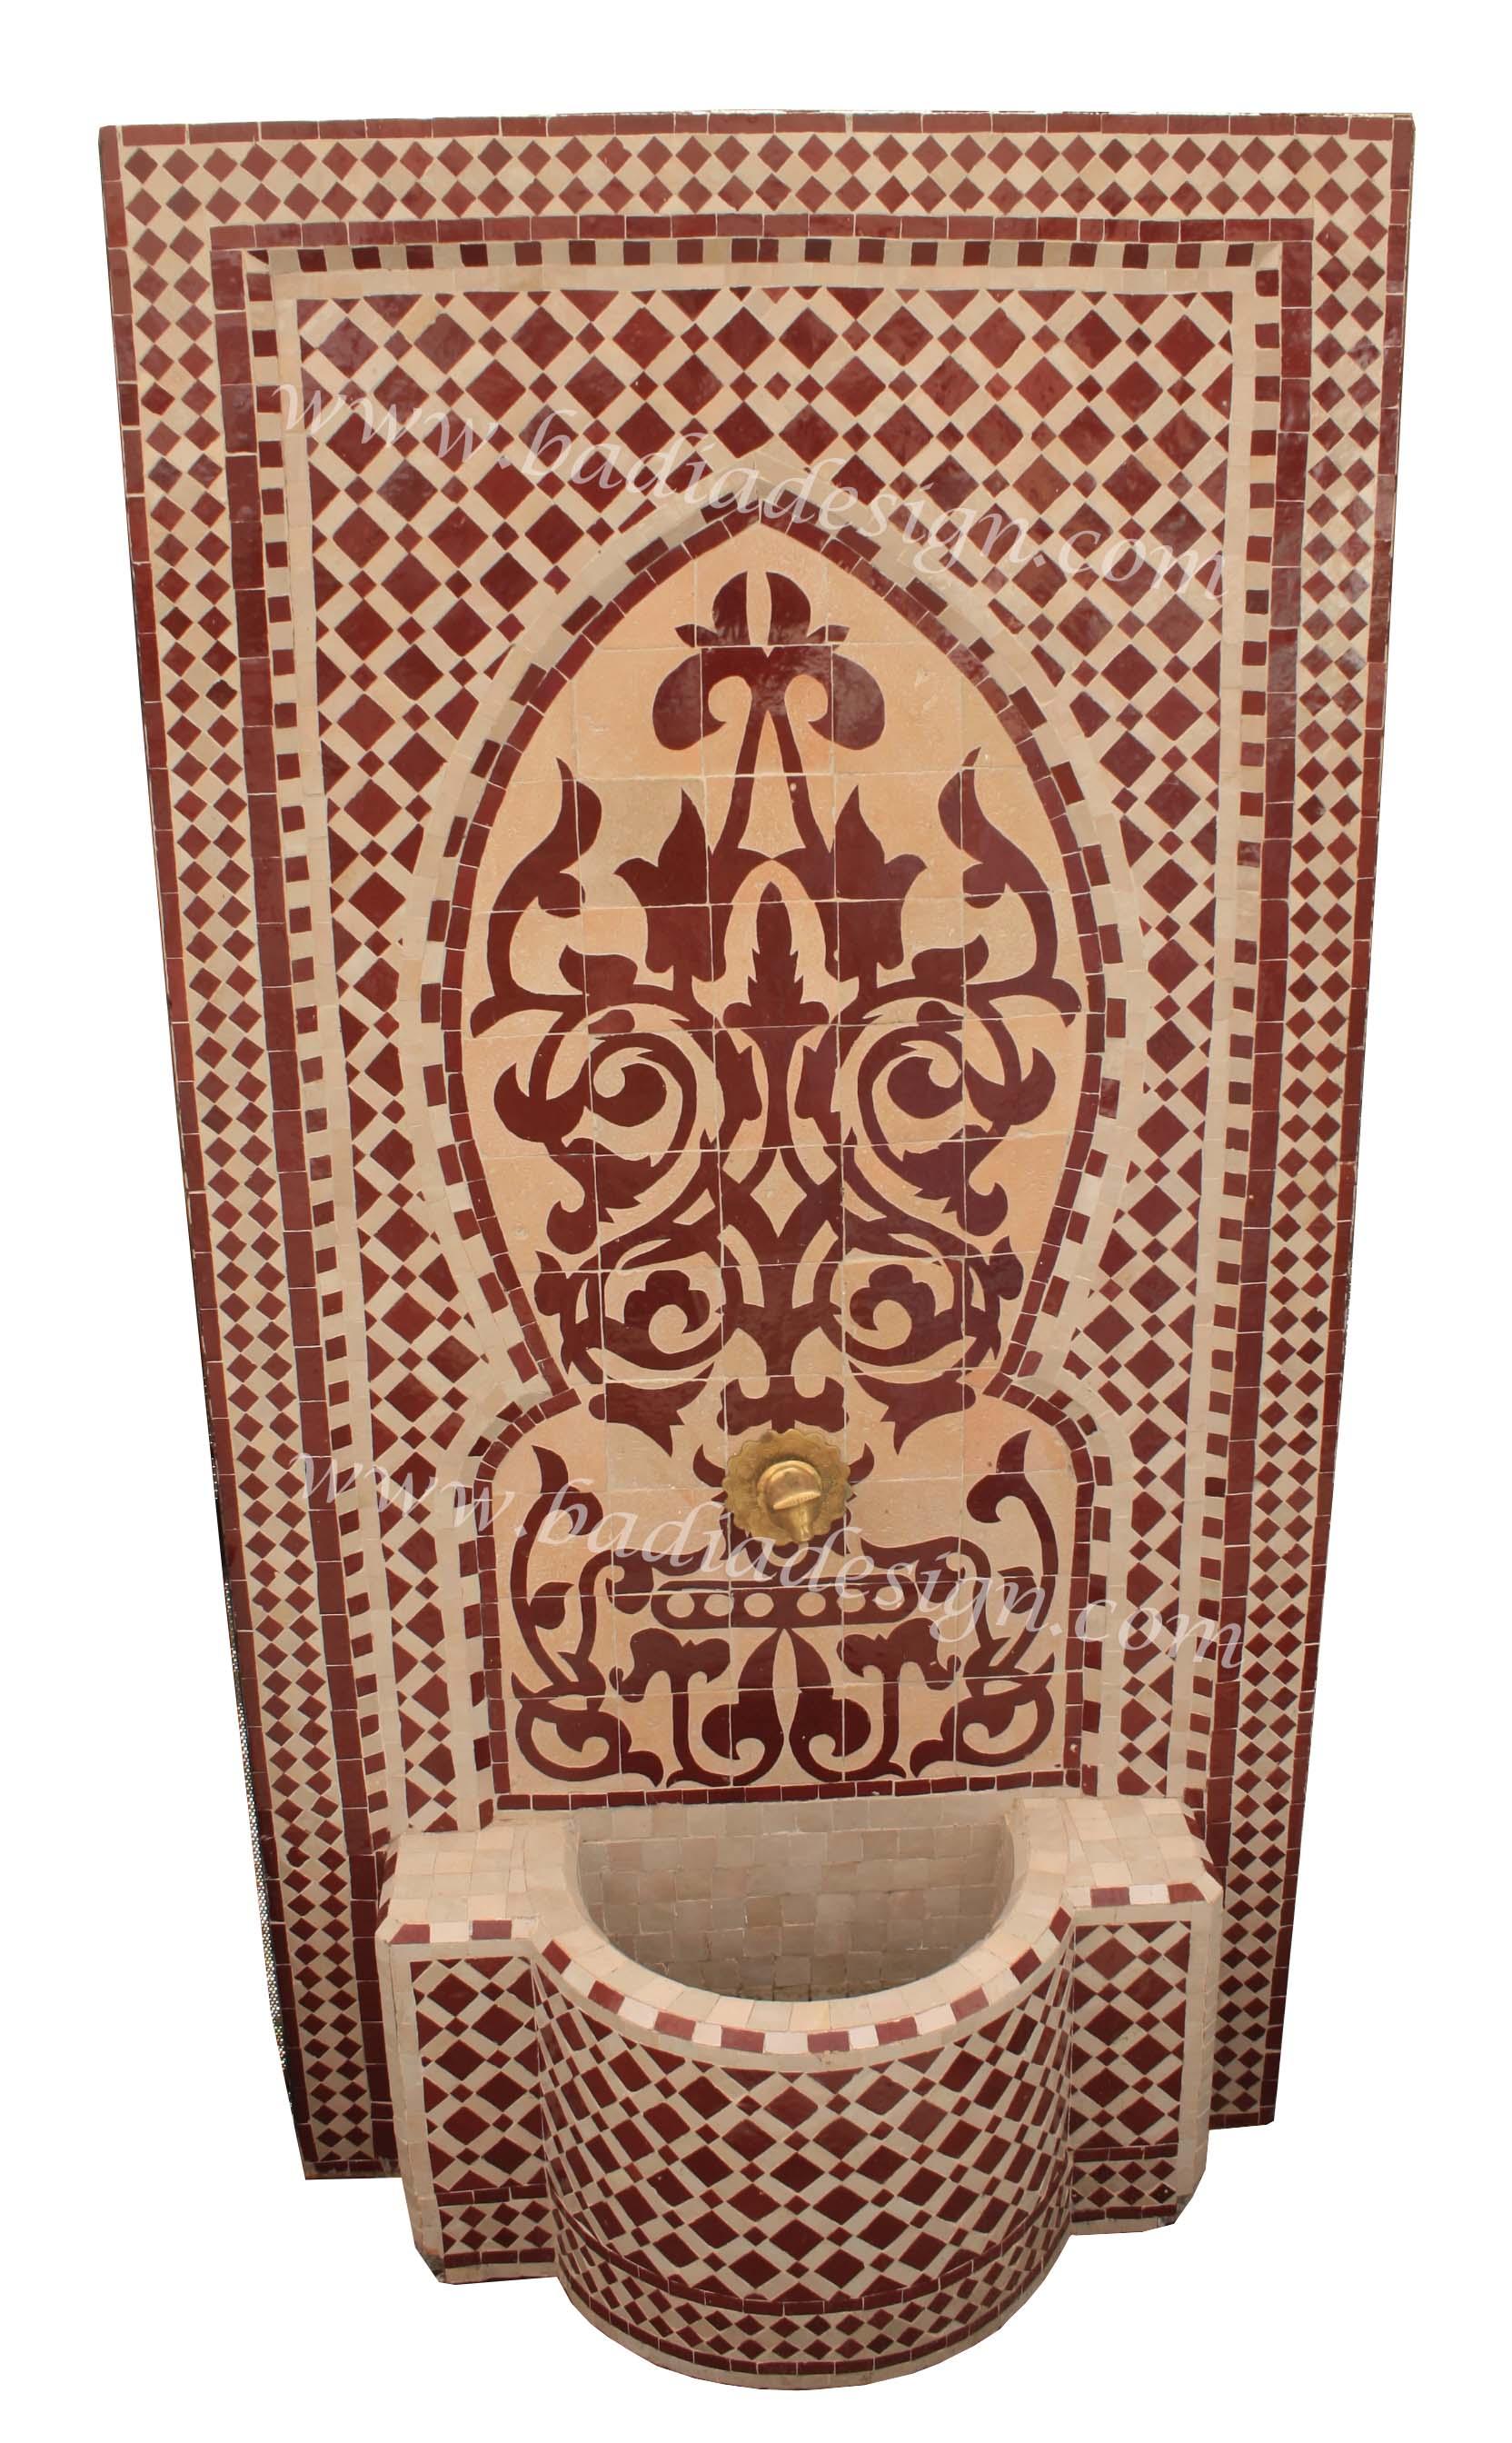 moroccan-mosaic-water-fountain-mf640.jpg